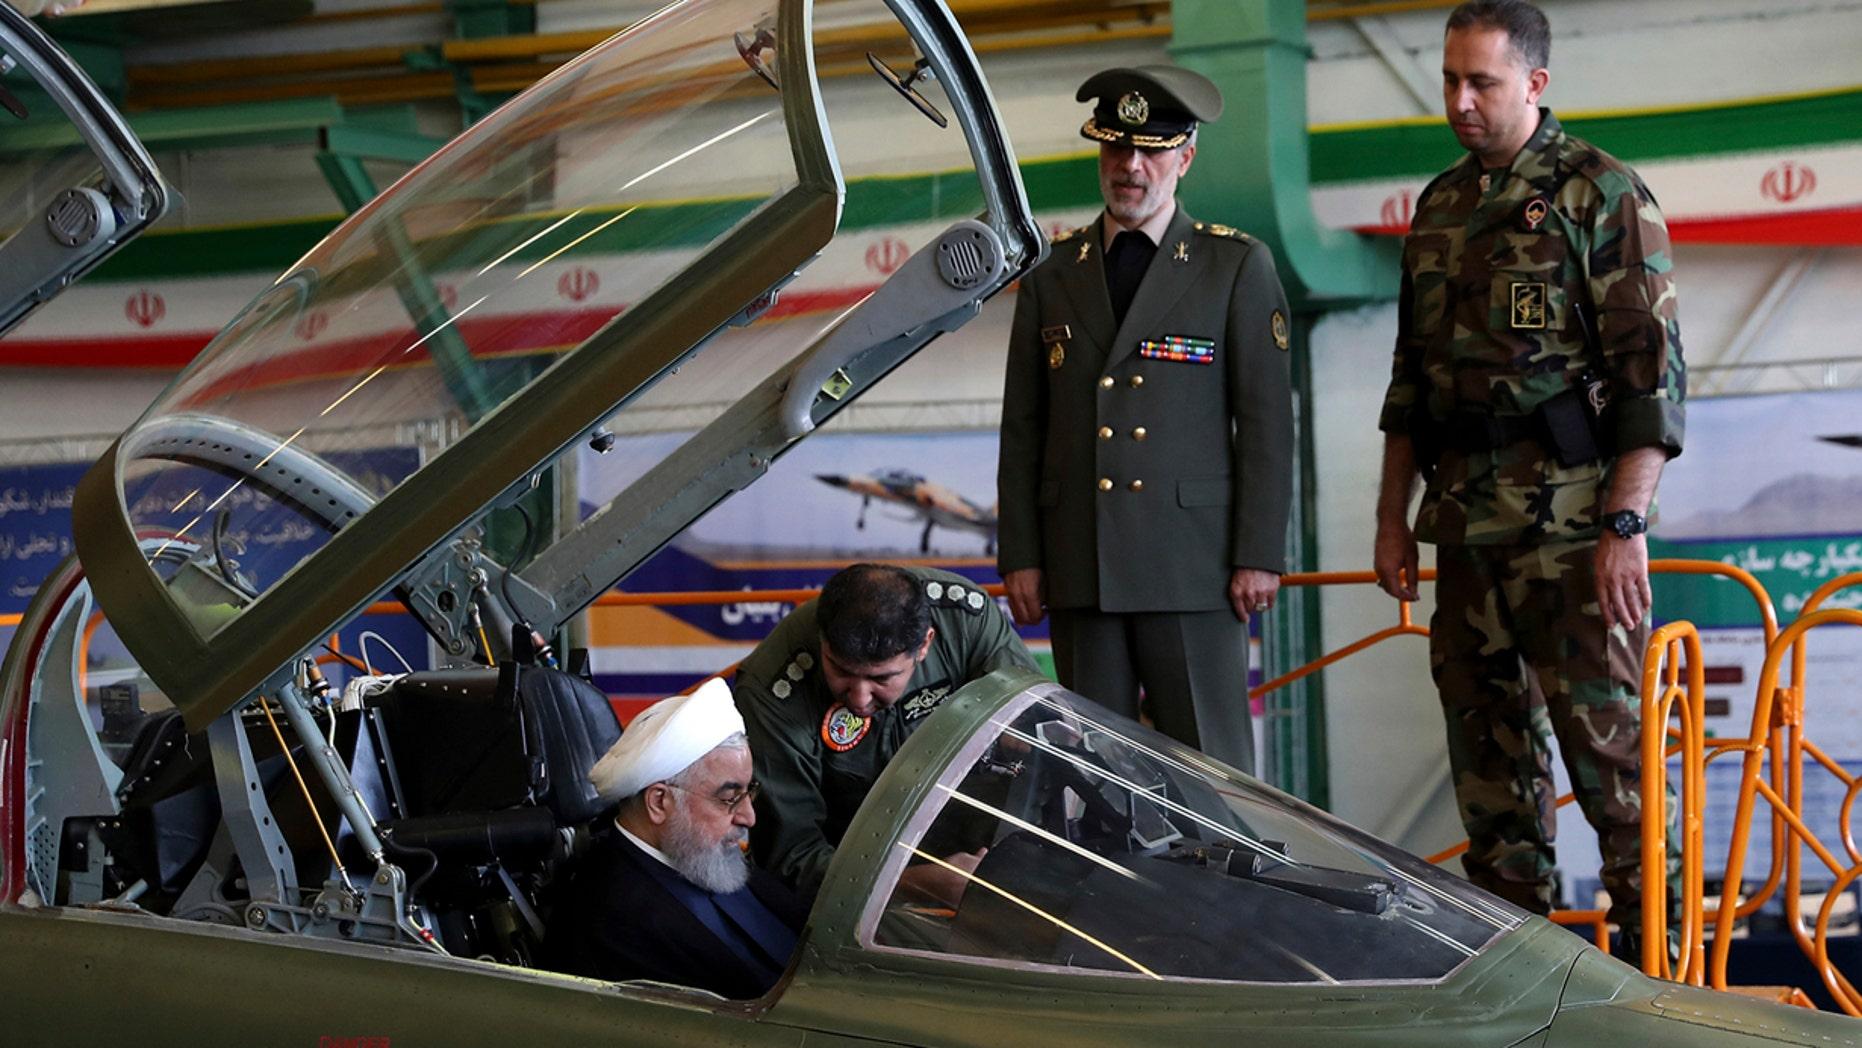 Iran unveils new fighter jet with Washington in mind | Fox News